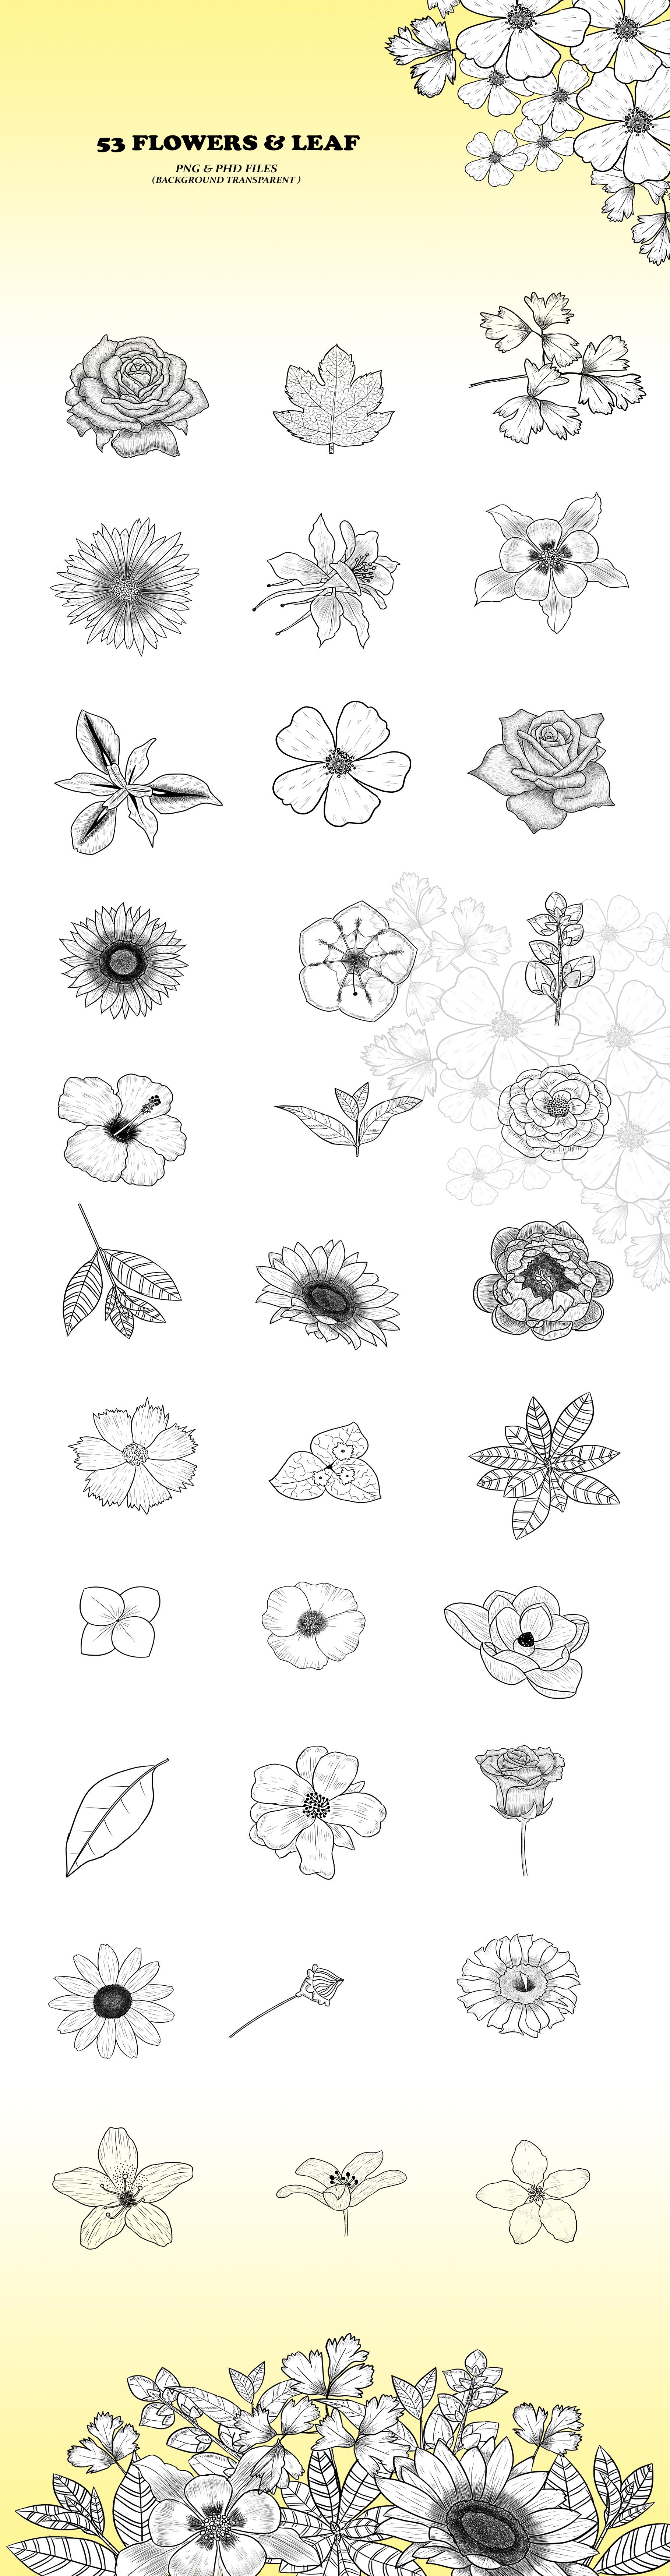 Native American Flowers Illustration example image 3